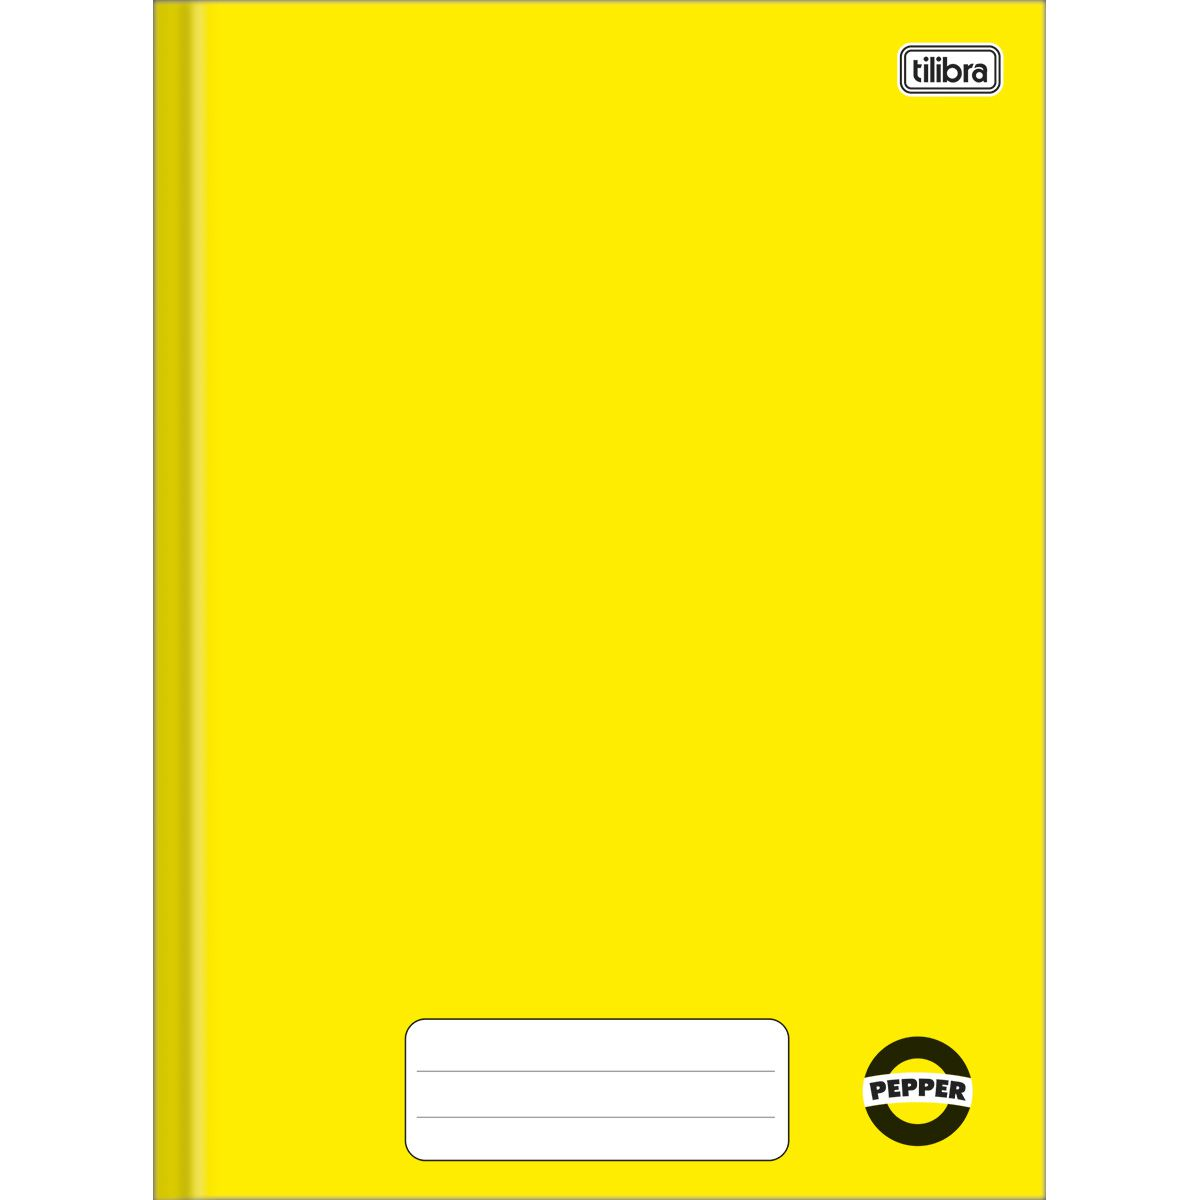 Caderno brochura 40 fls amarelo PEPPER Tilibra